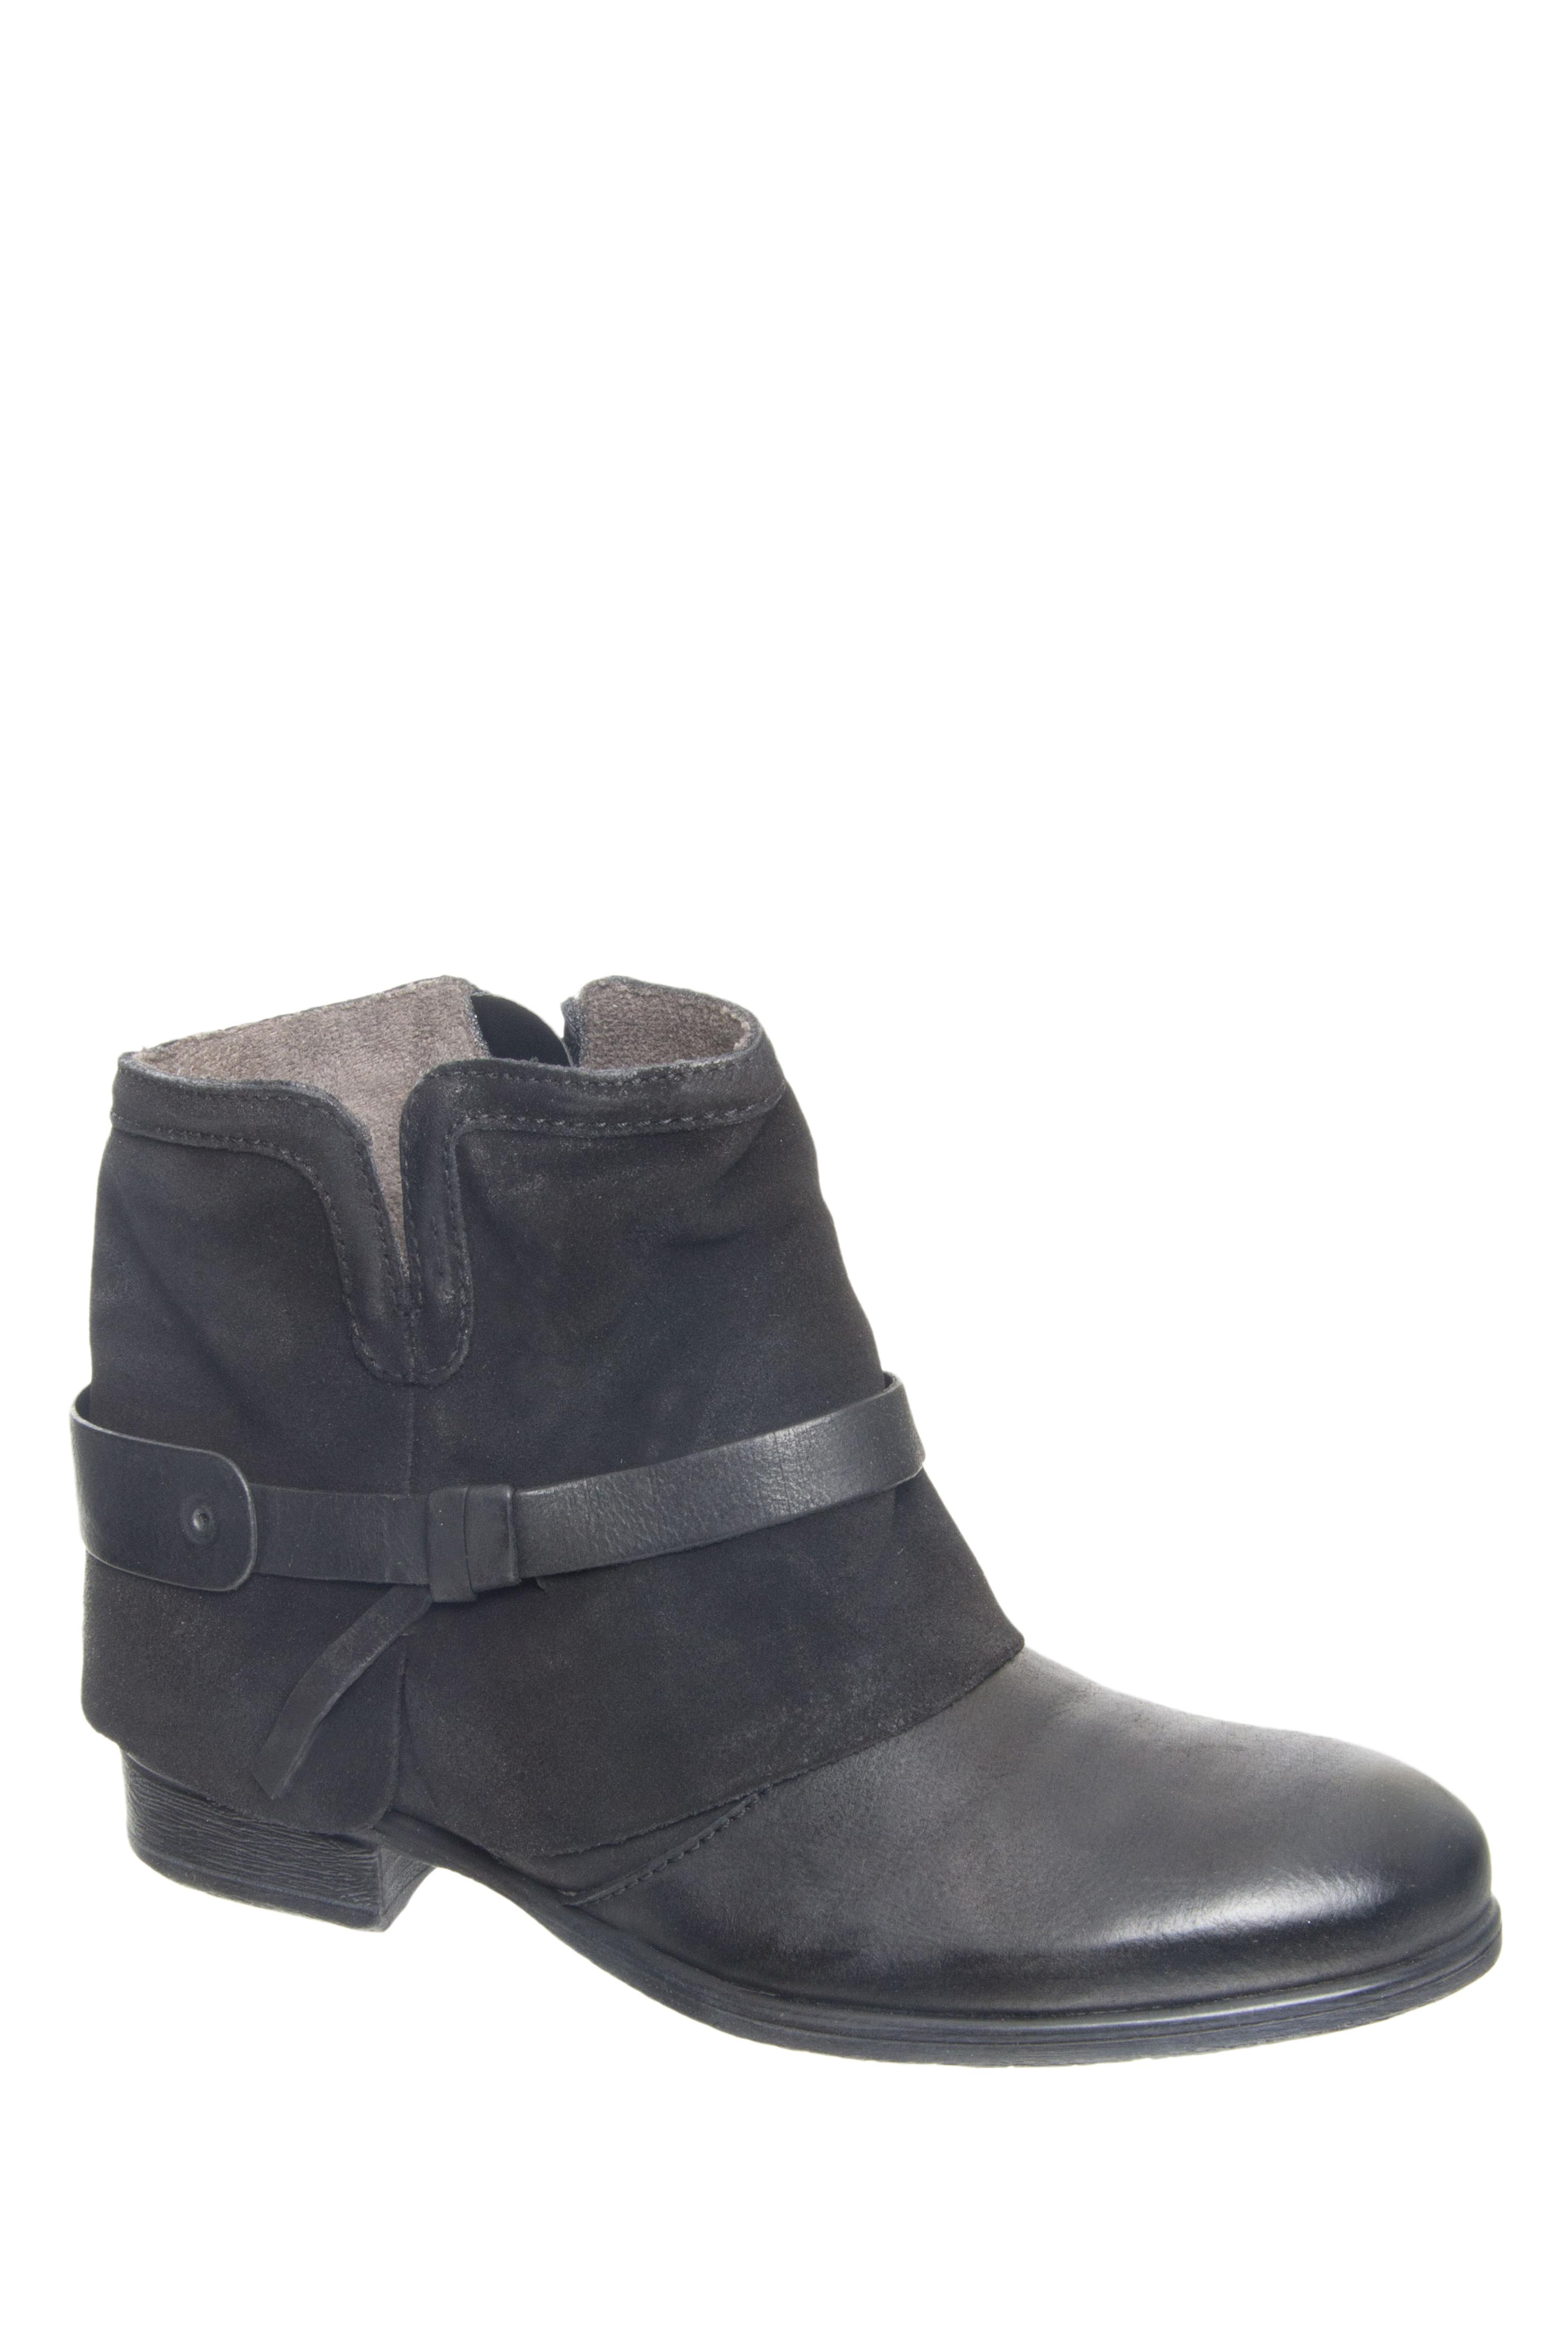 MIZ MOOZ Seymour Low Heel Booties - Black